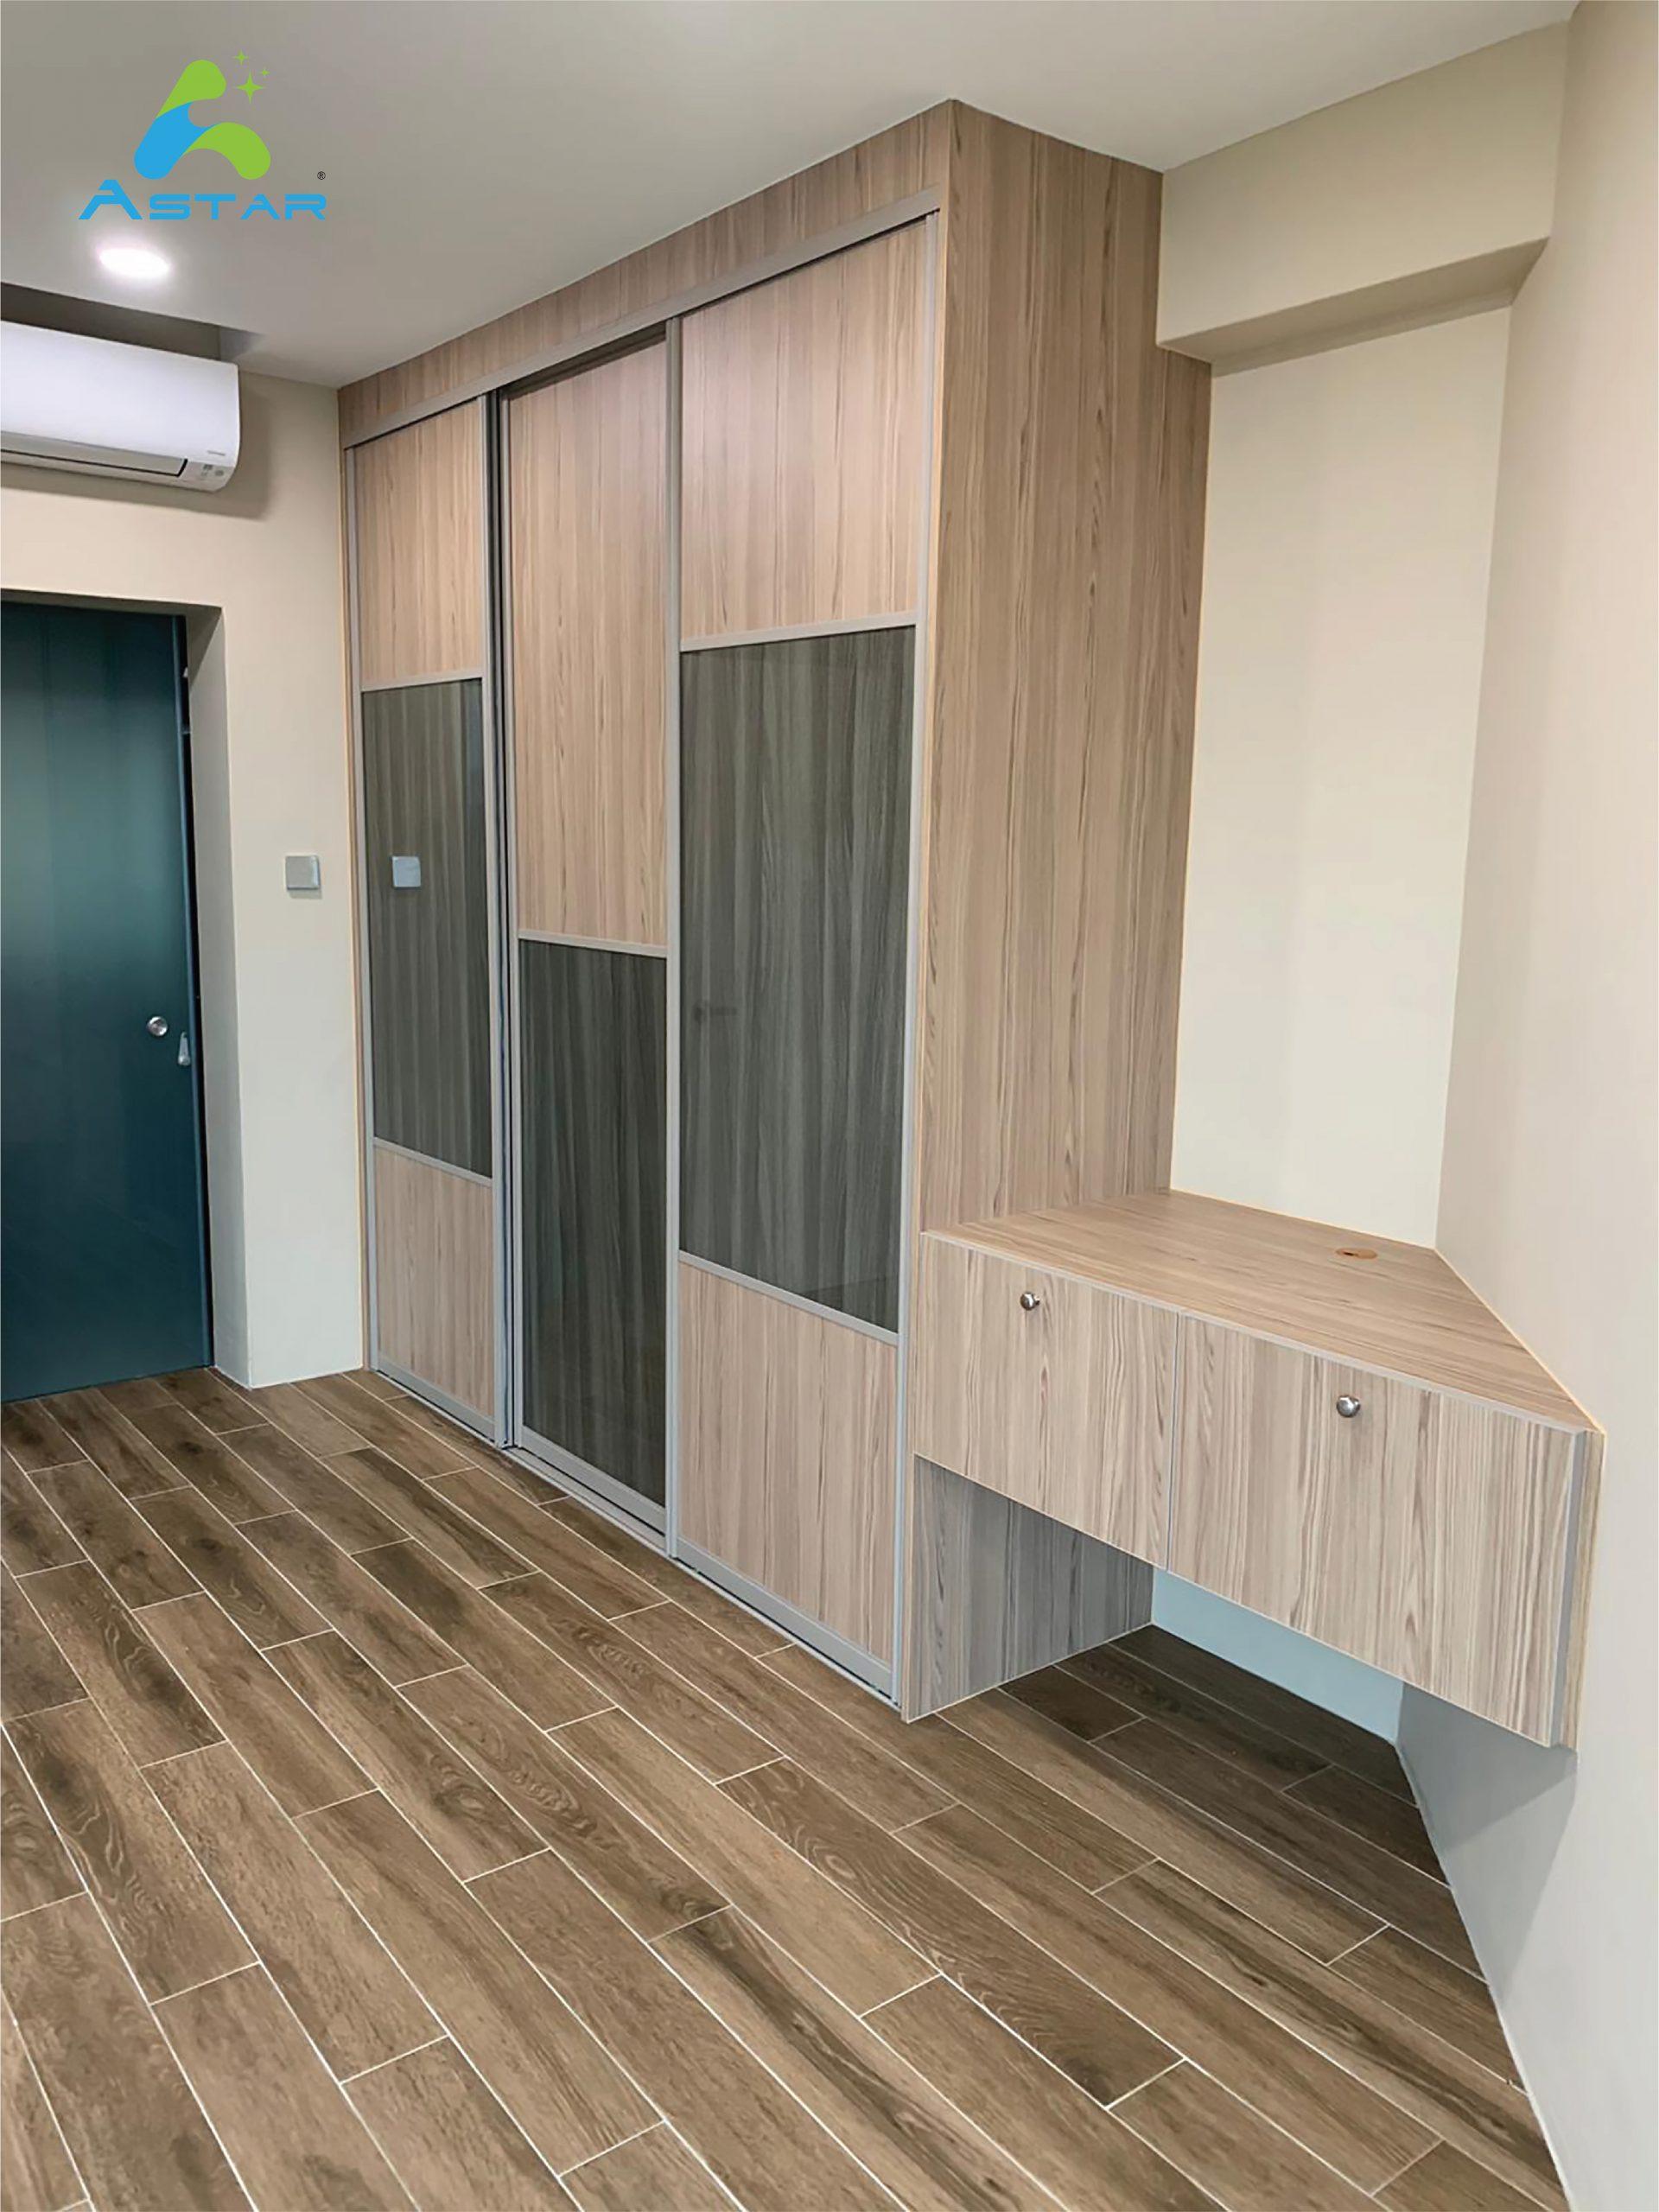 astar furnishing aluminum furniture projects Yew Mei Green Condominium 14